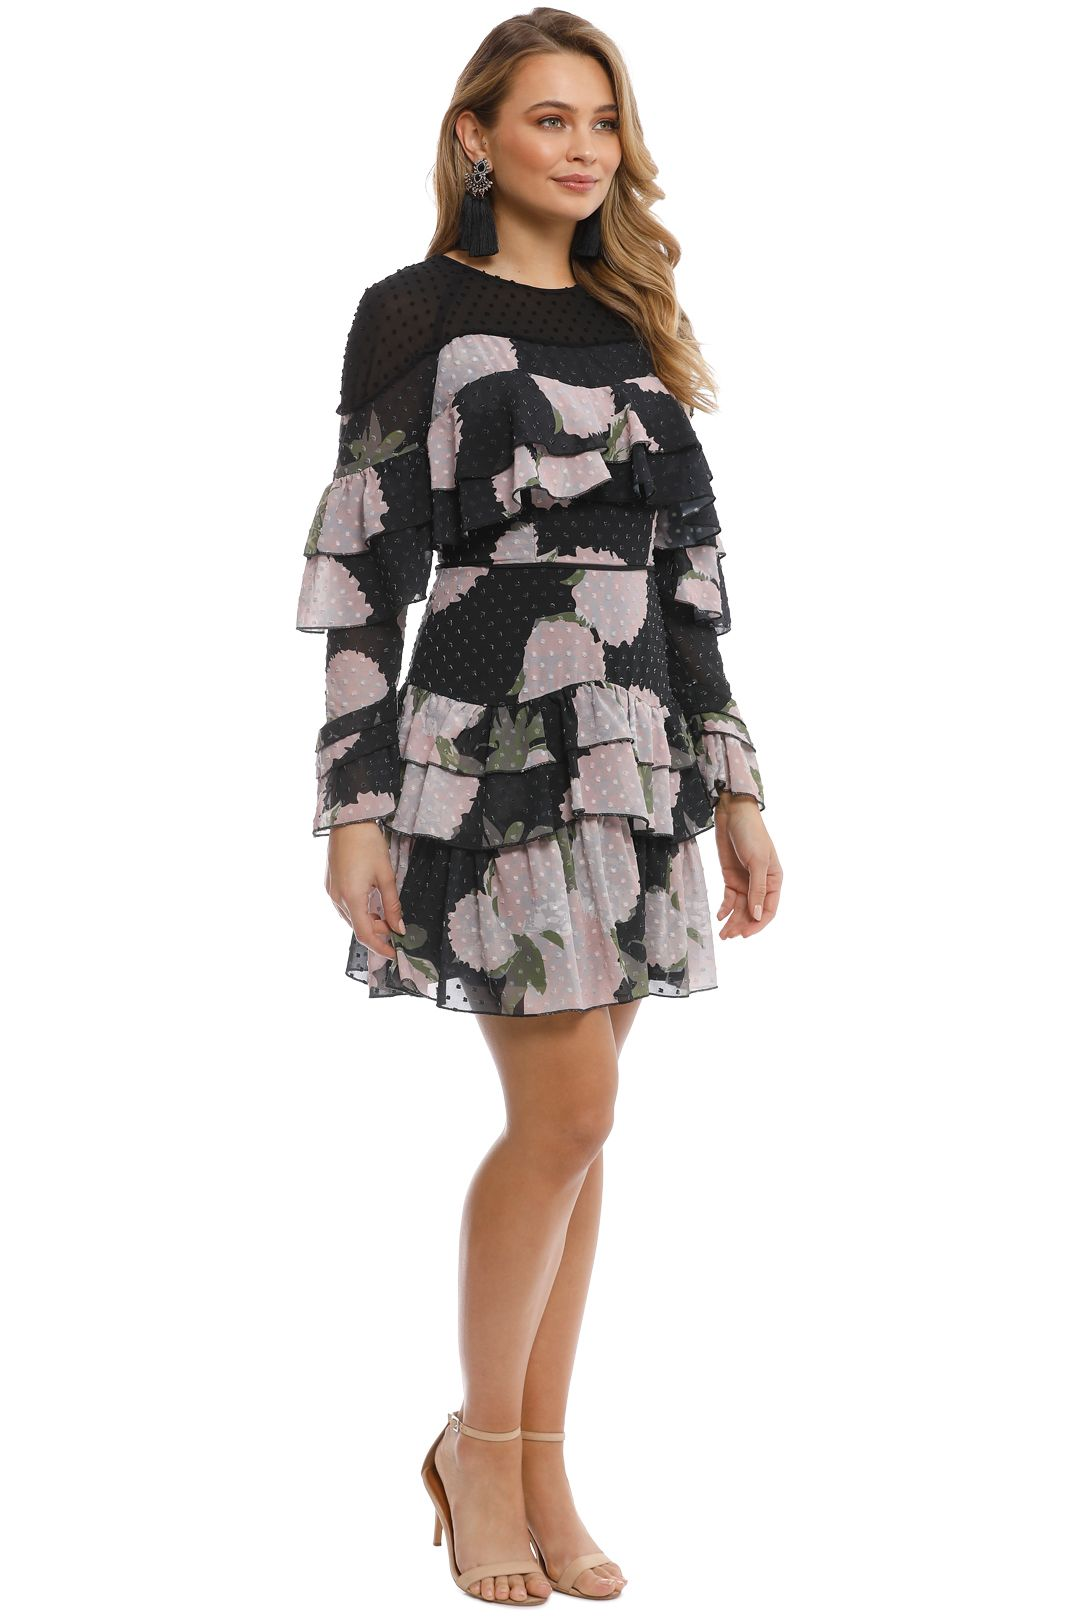 Talulah - New Woman Ruffle Mini Dress - Black Floral - Side